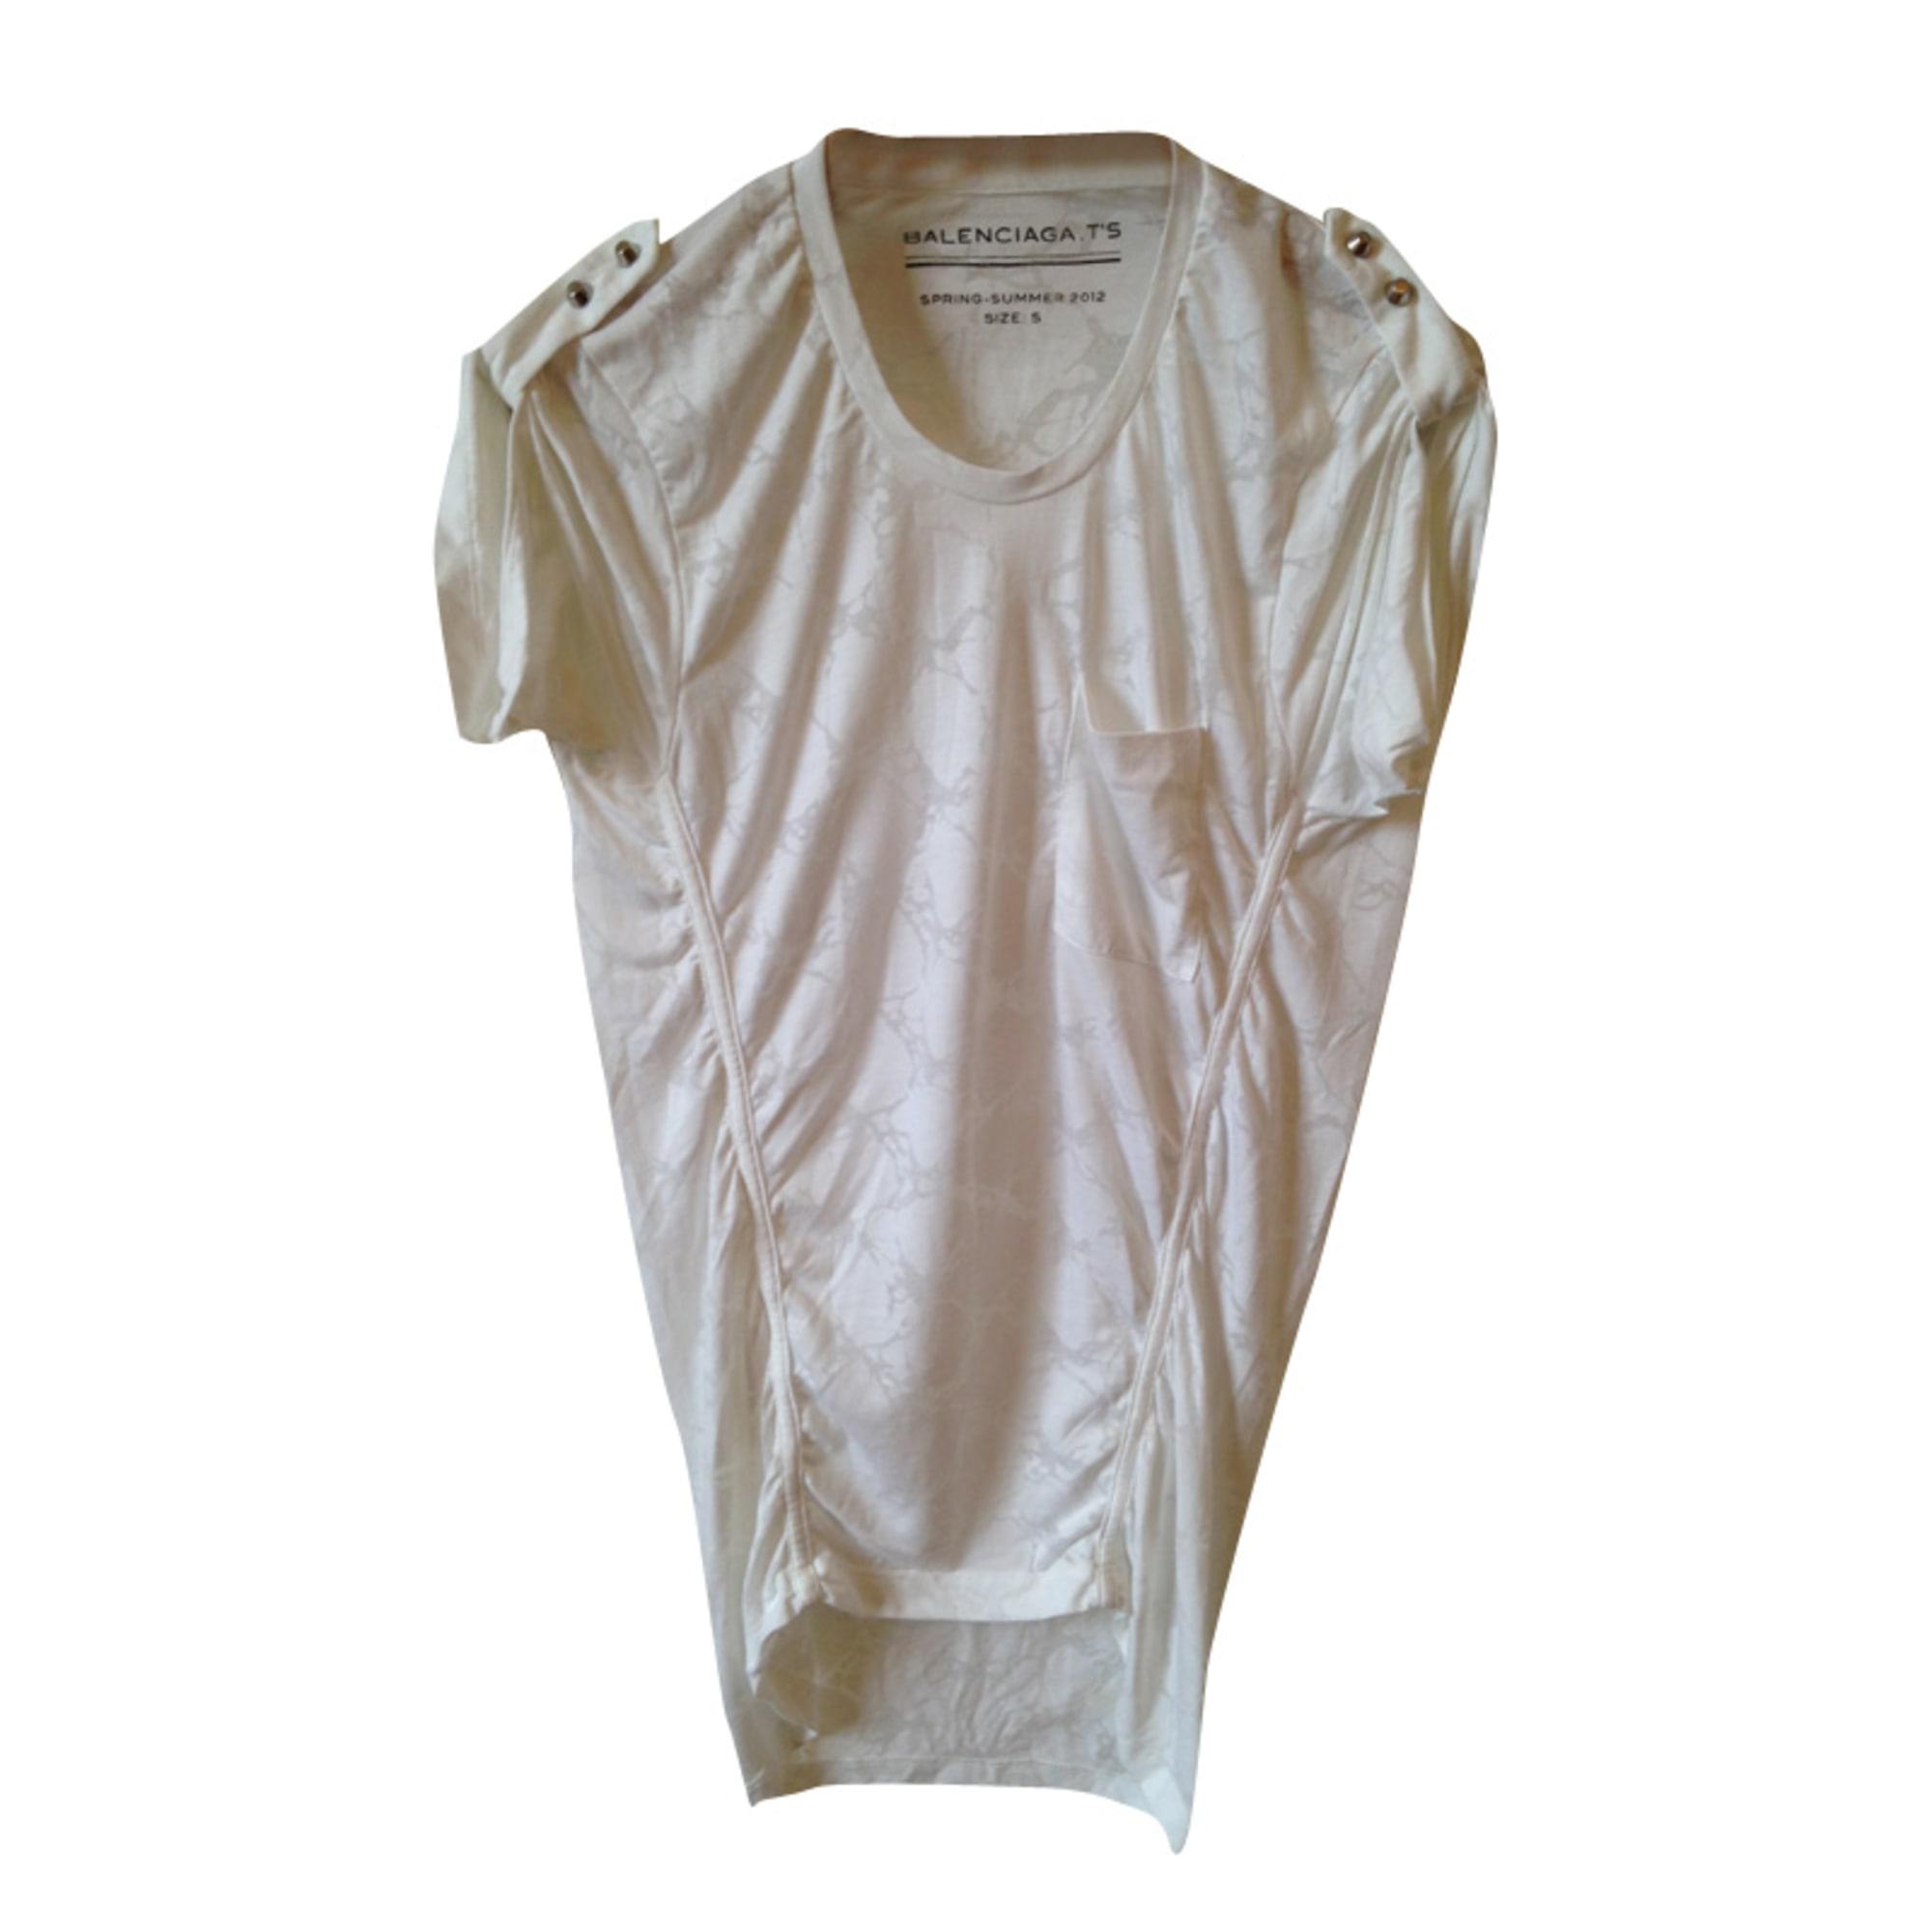 Tops, T-Shirt BALENCIAGA Weiß, elfenbeinfarben